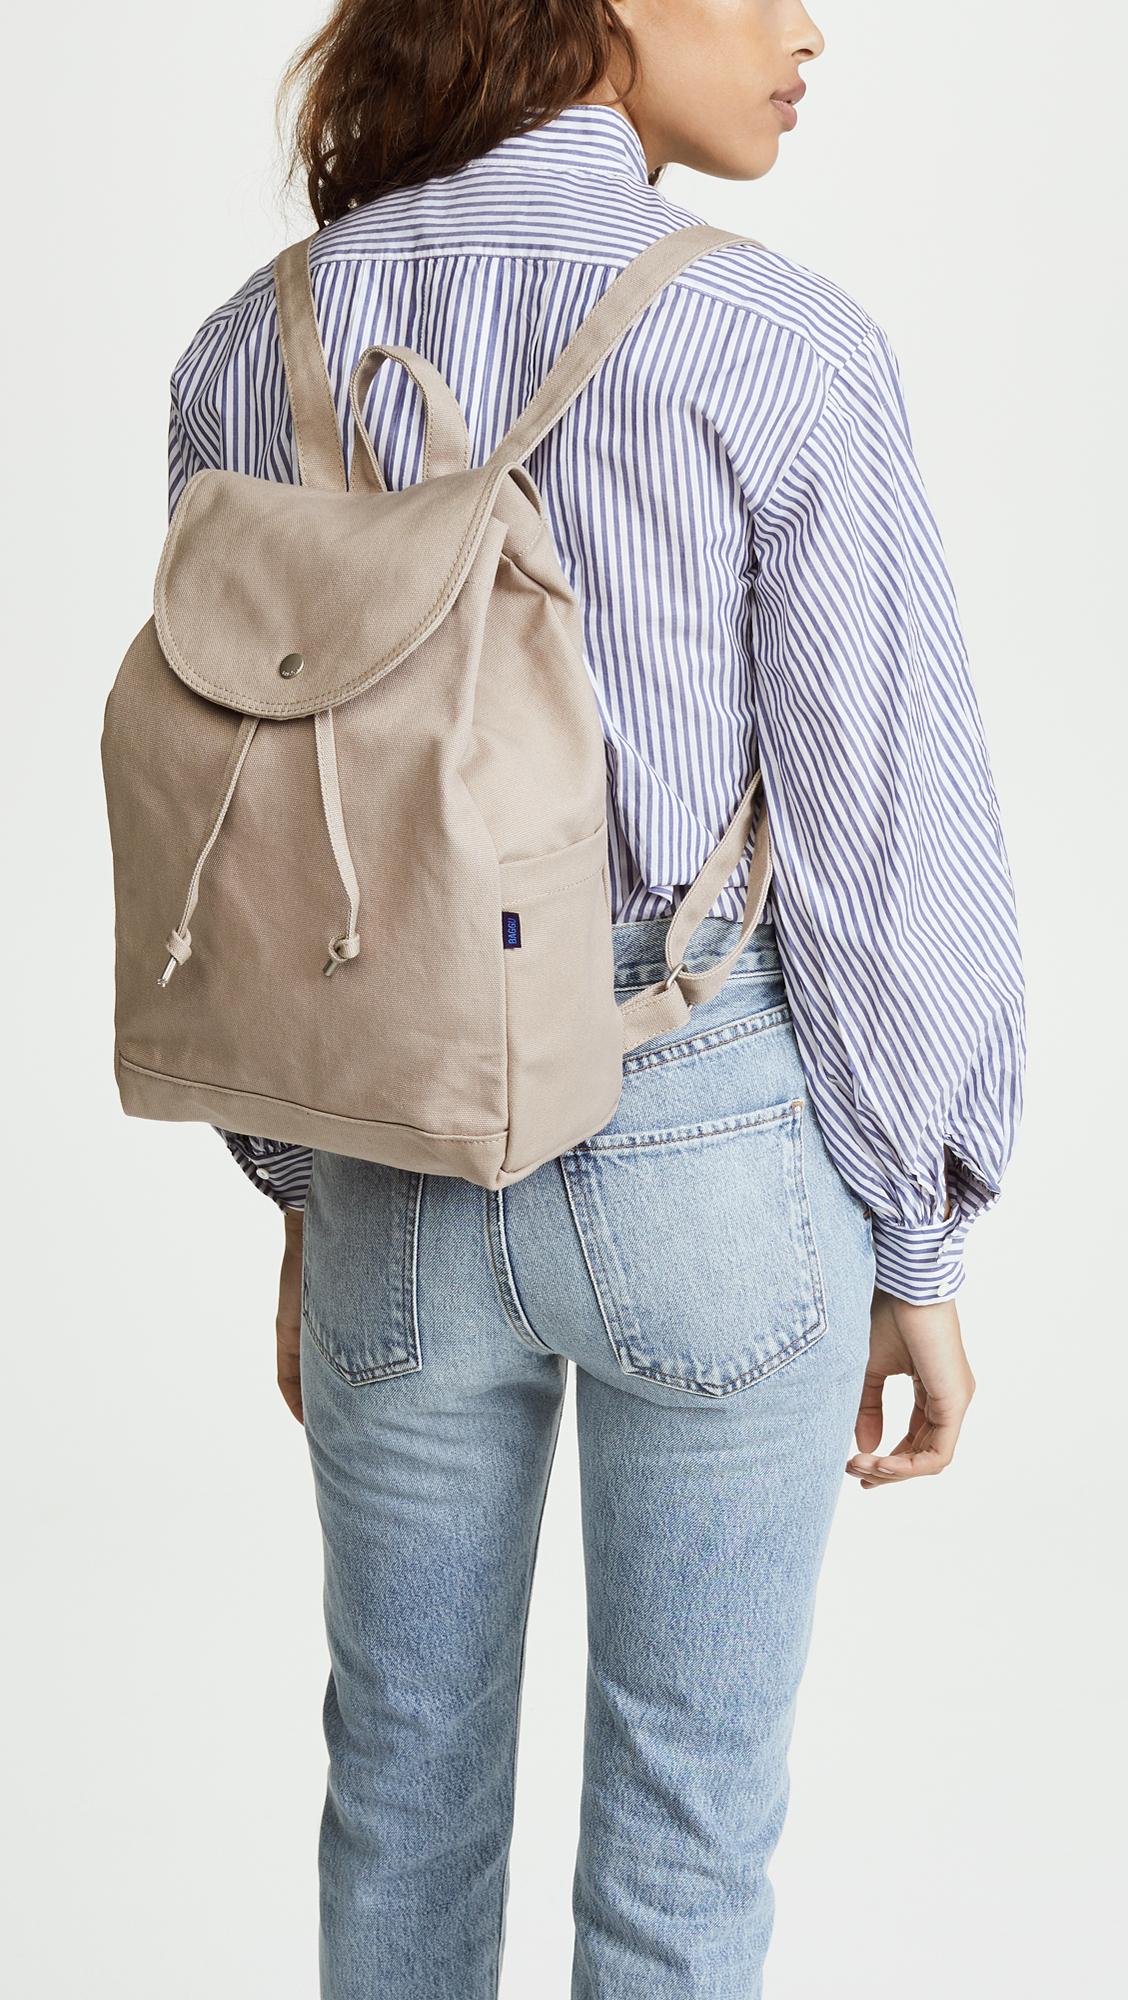 c79159526 BAGGU Drawstring Backpack | SHOPBOP